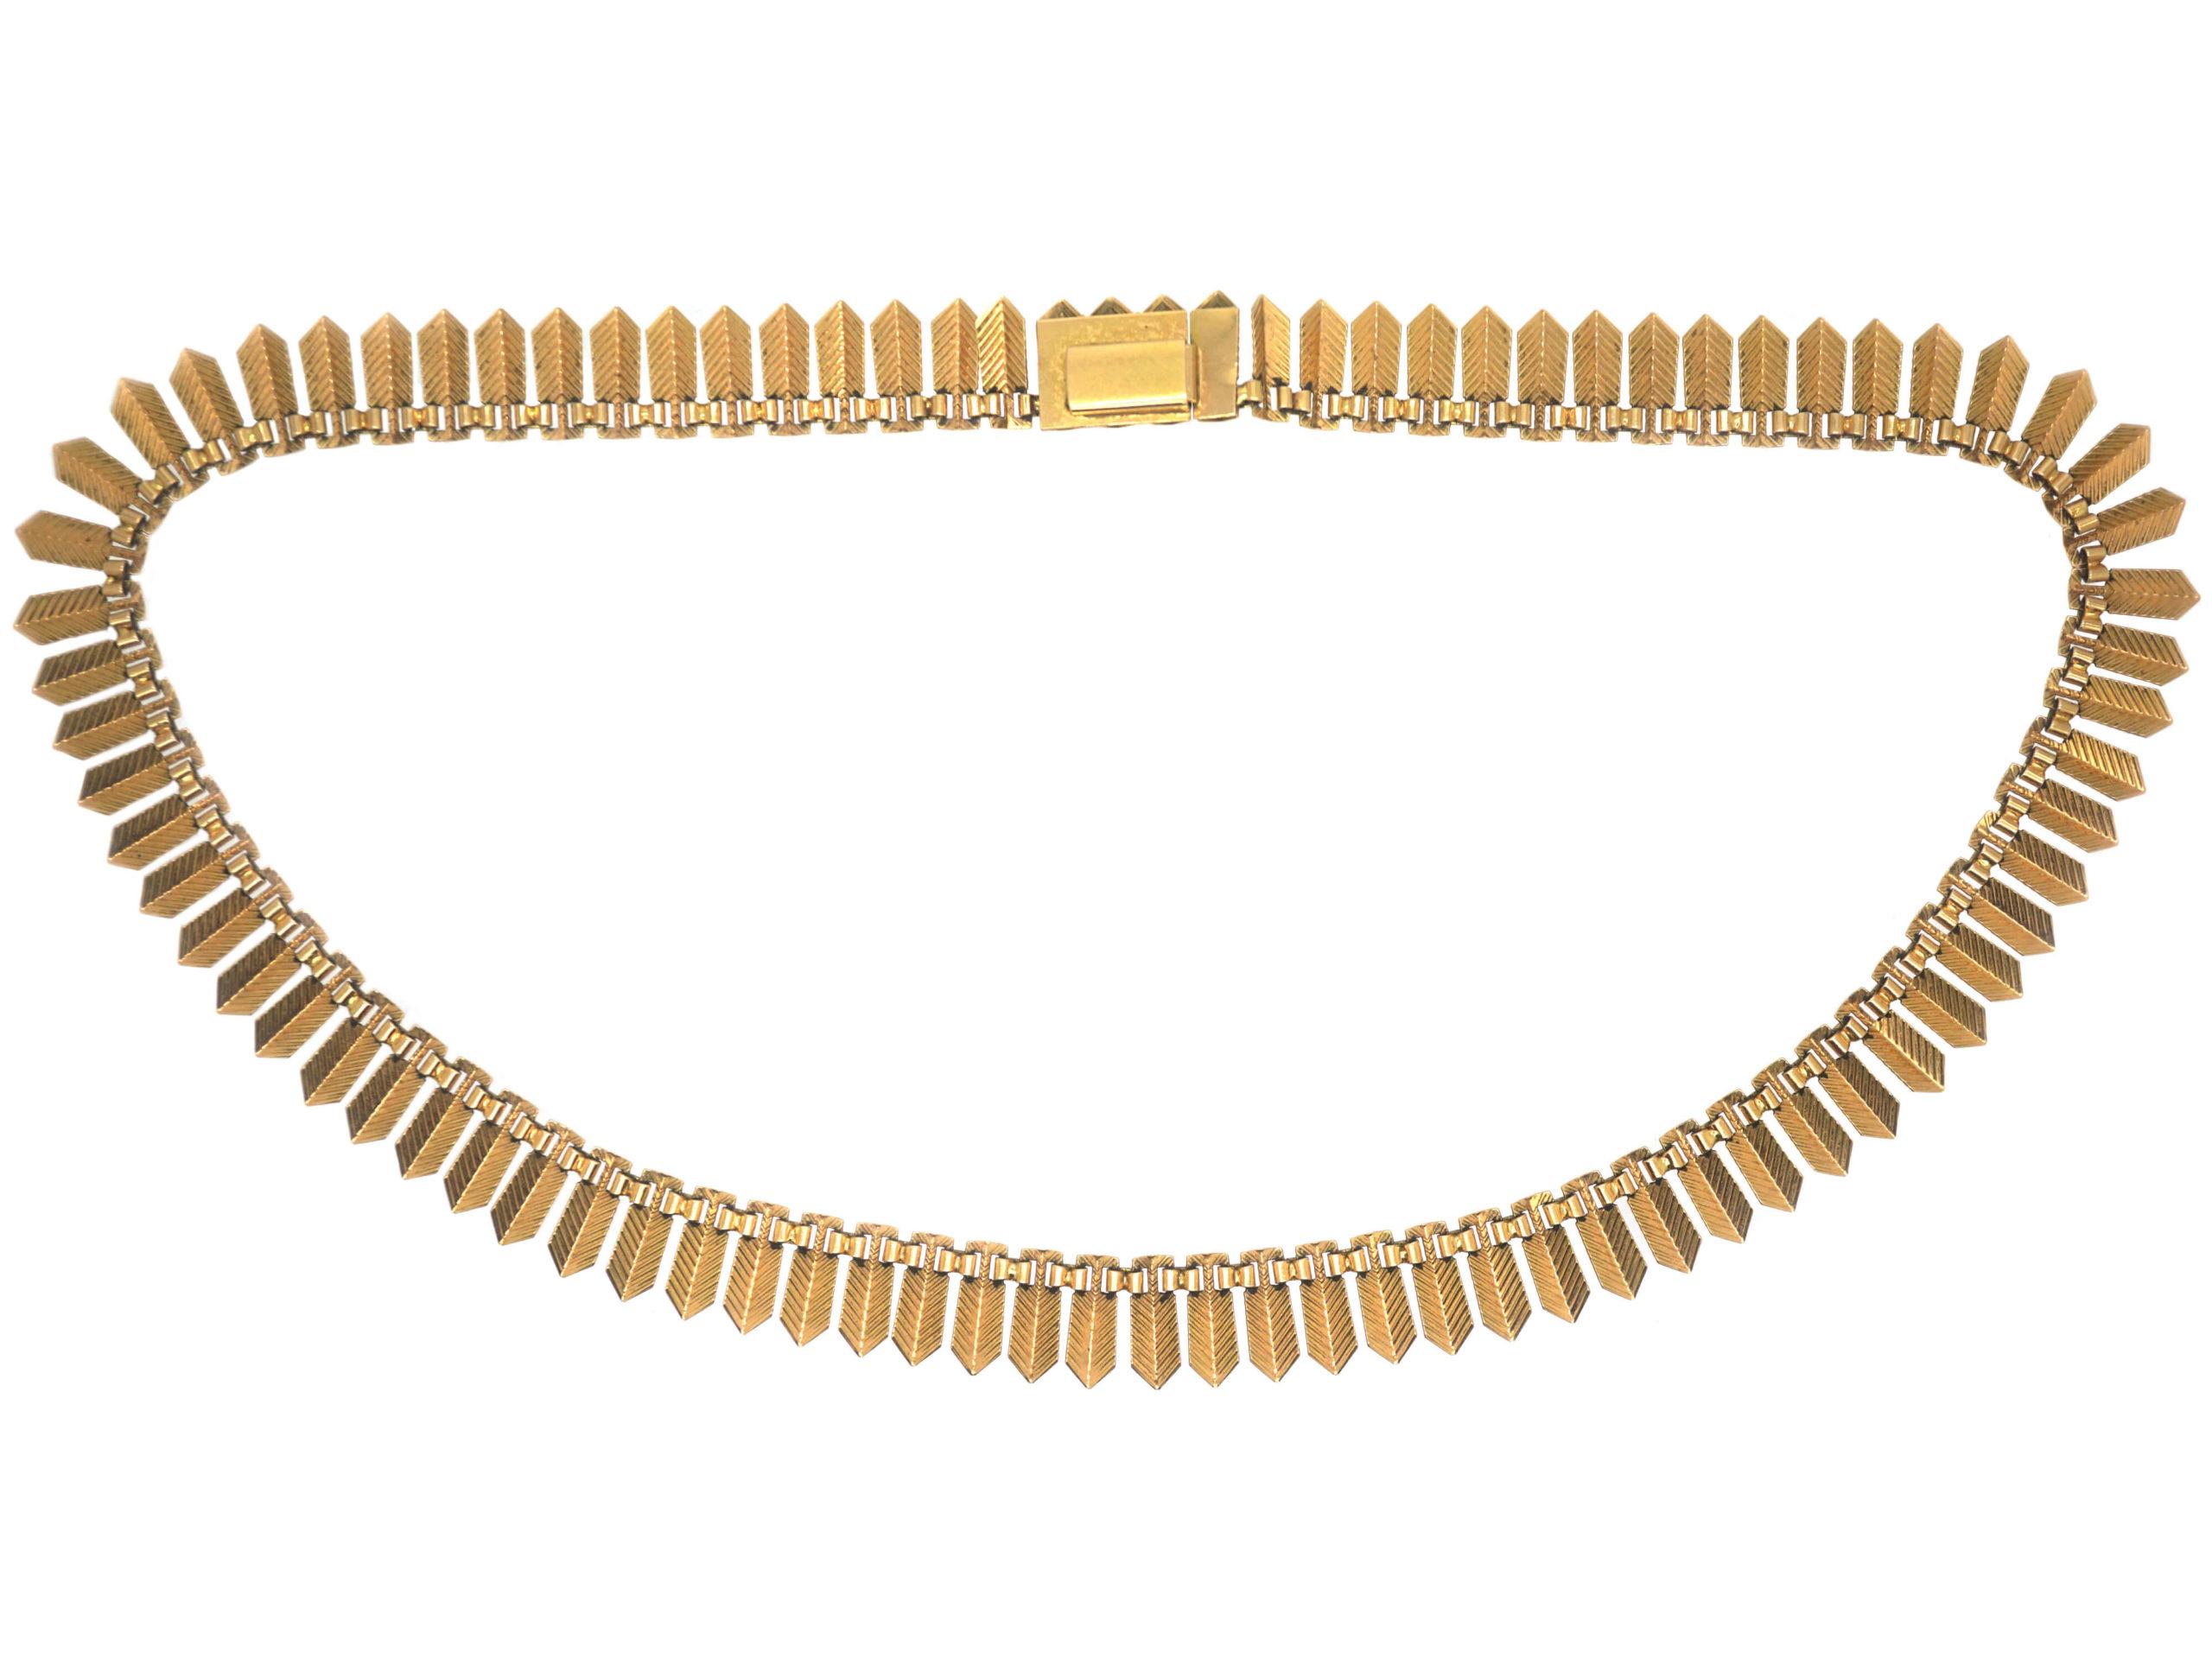 French 18ct Gold Fringe Necklace